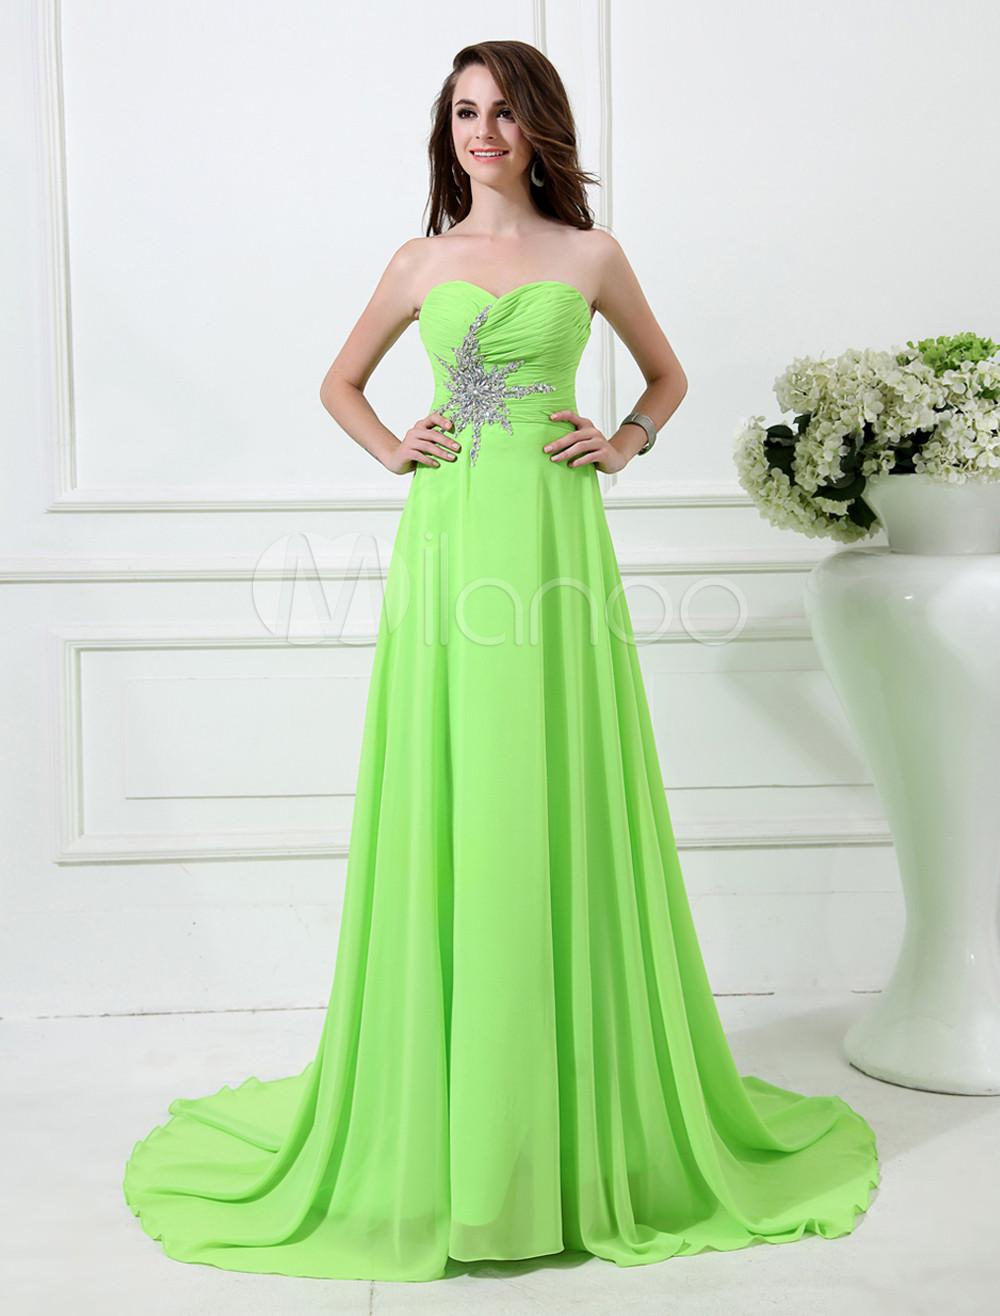 Lime Green Beading Chiffon Prom Dress (Wedding Prom Dresses) photo